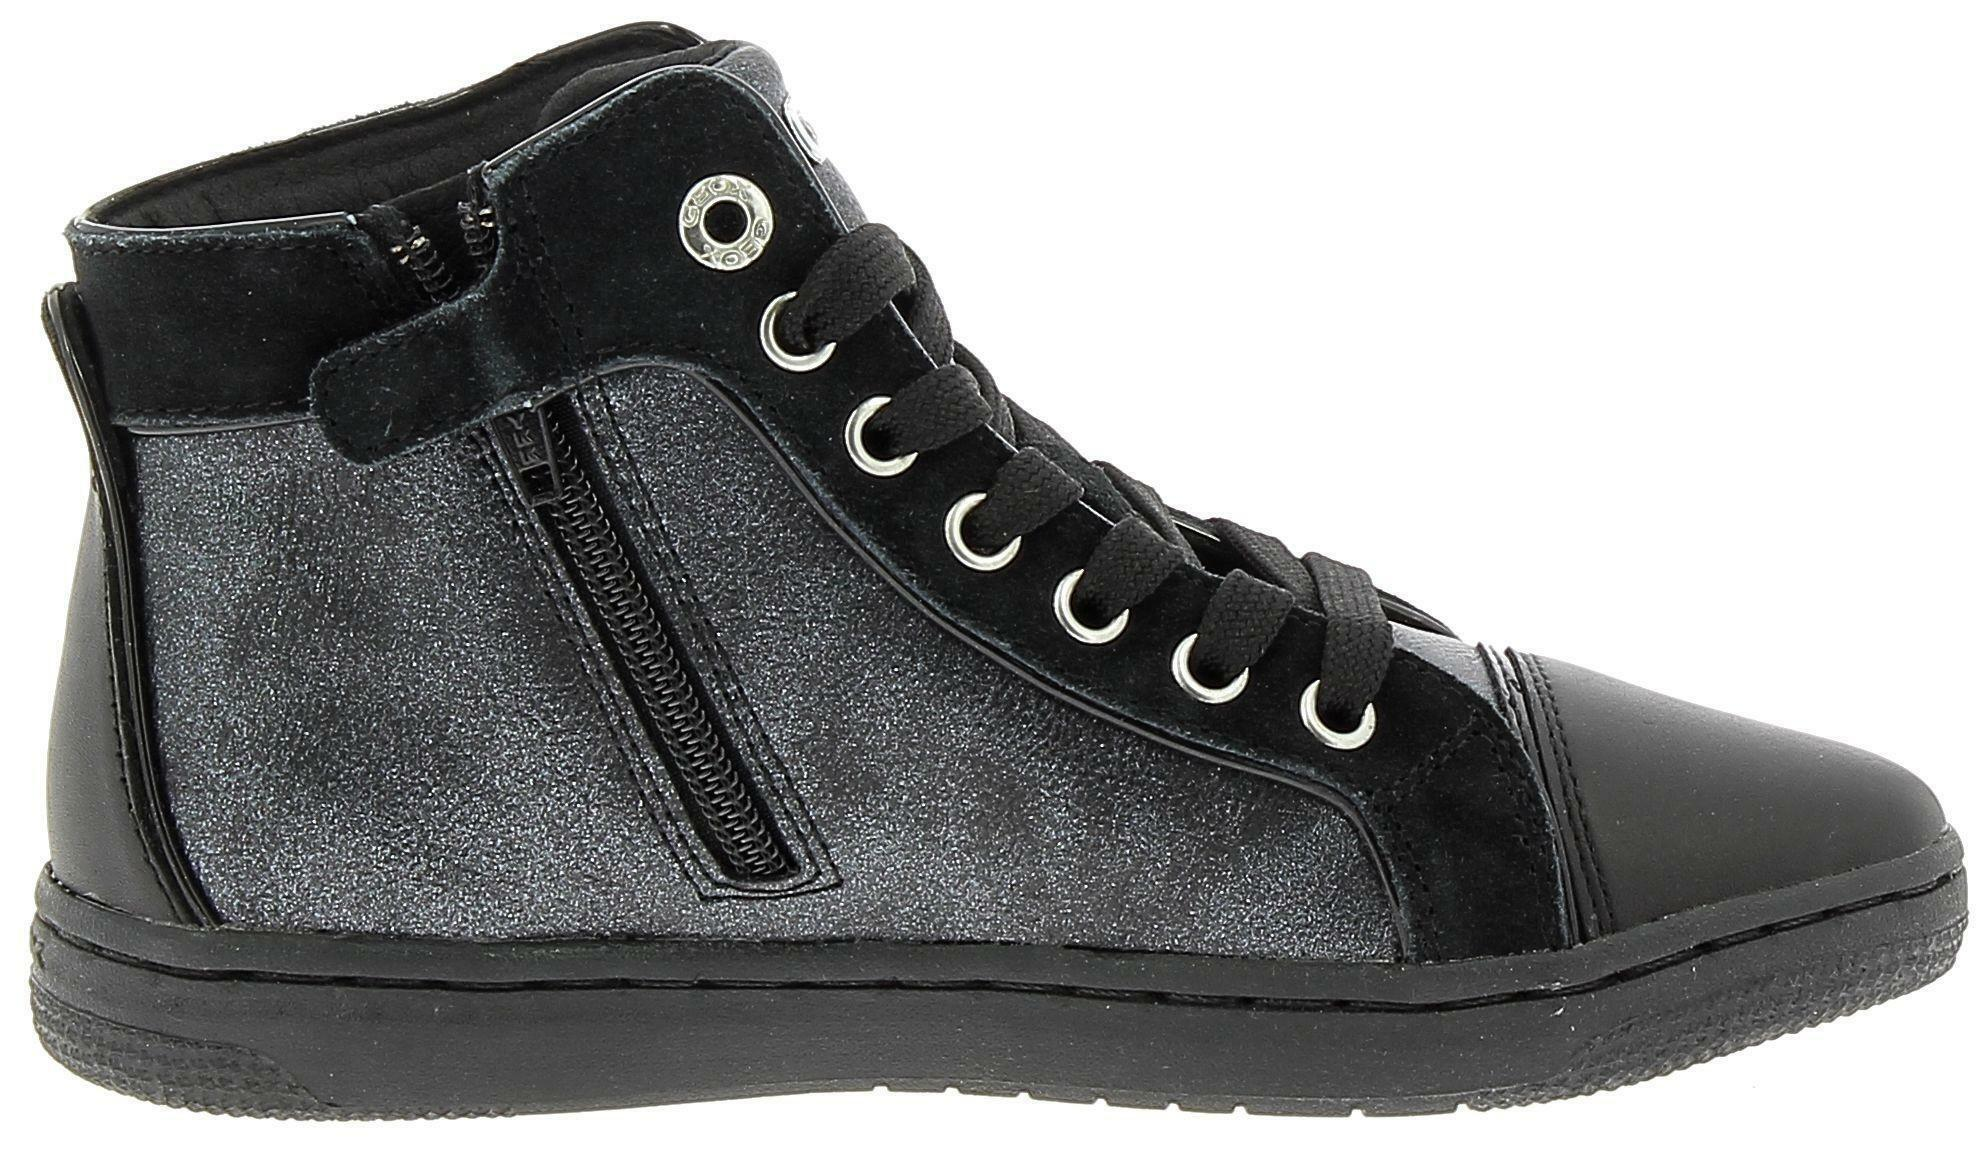 geox geox j creamy e scarpe sportive bambina nere